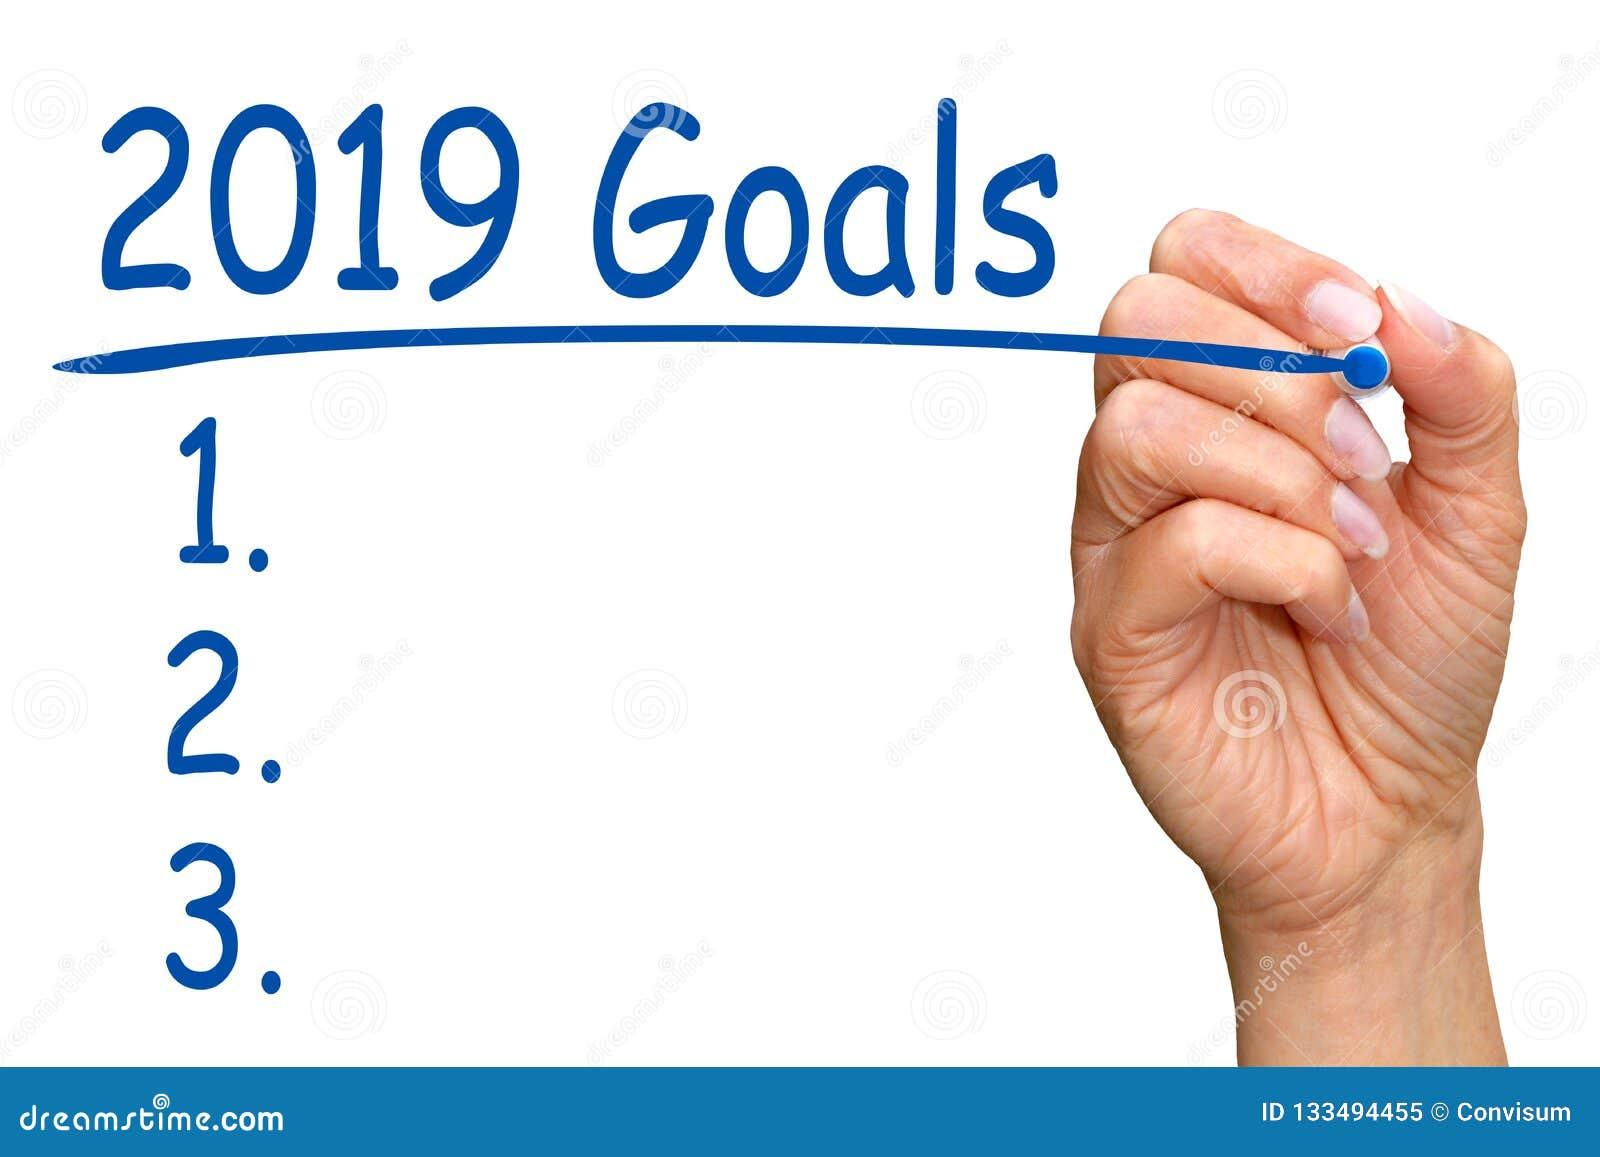 2019 Goals and Checklist